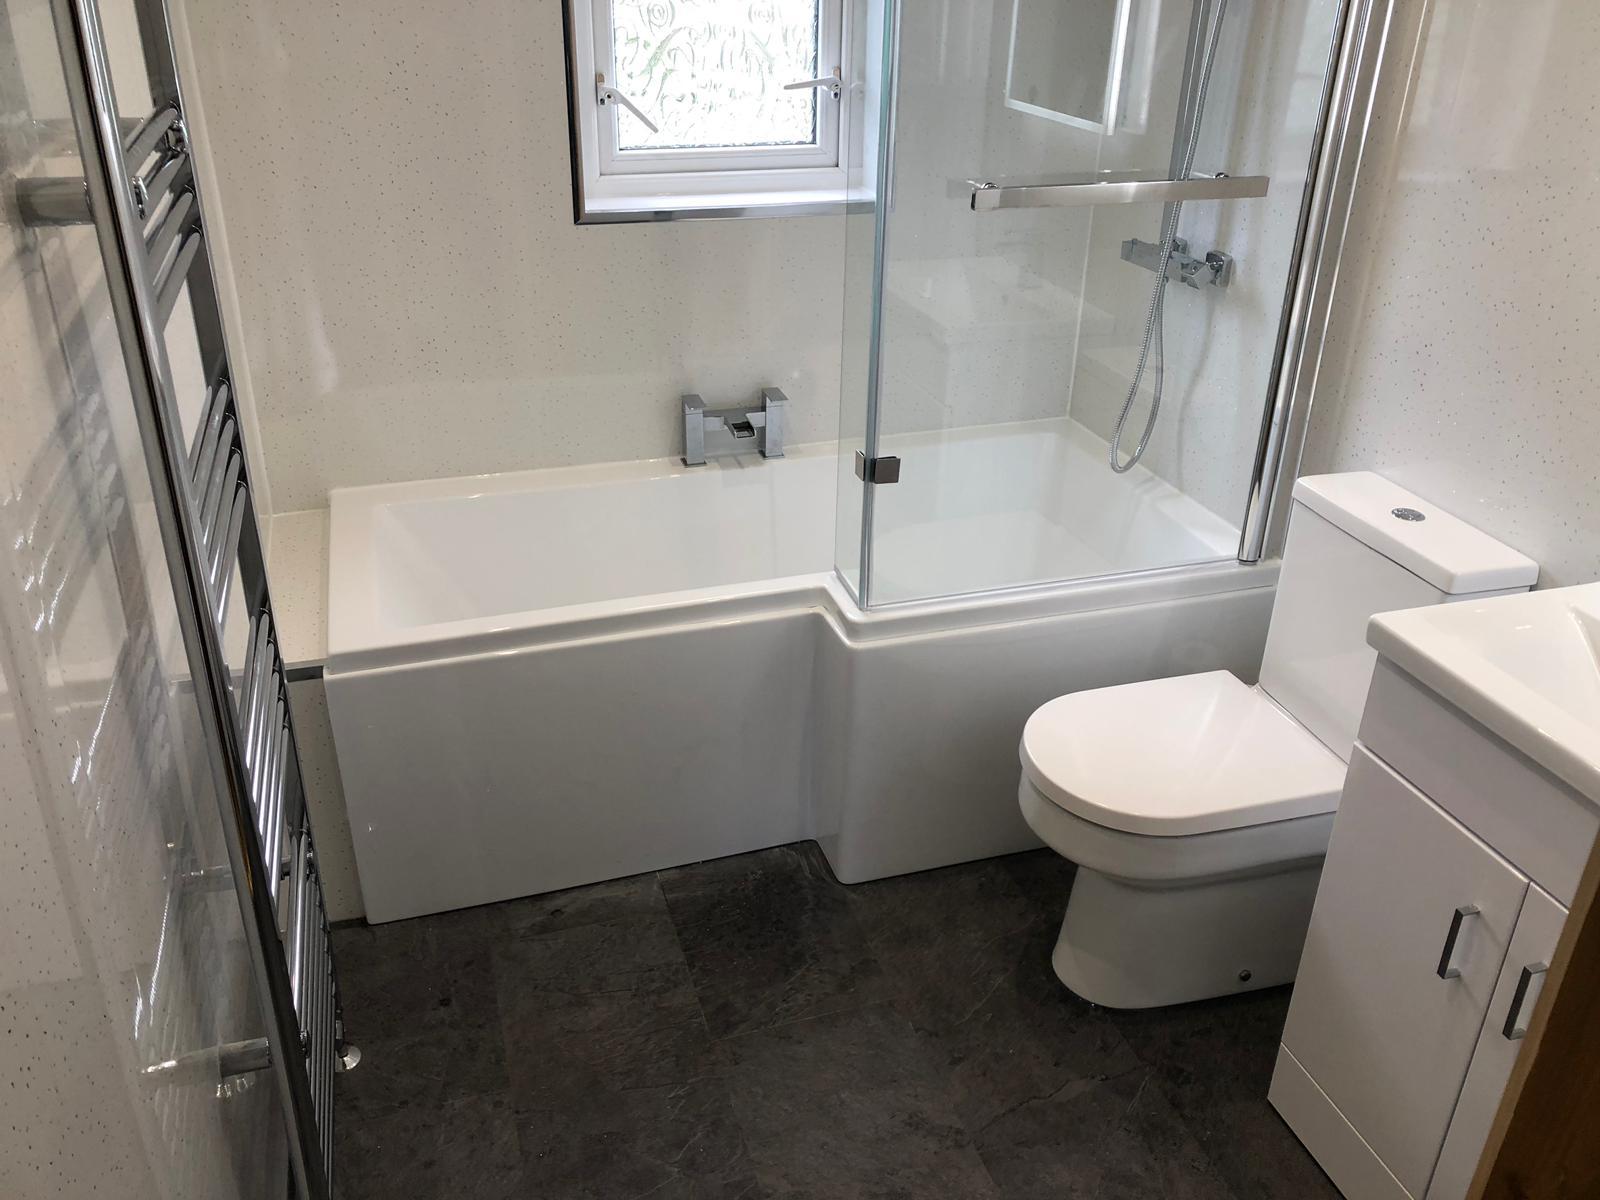 Bathroom refurbishment Belfast. PVC Panels. - Choice Interiors